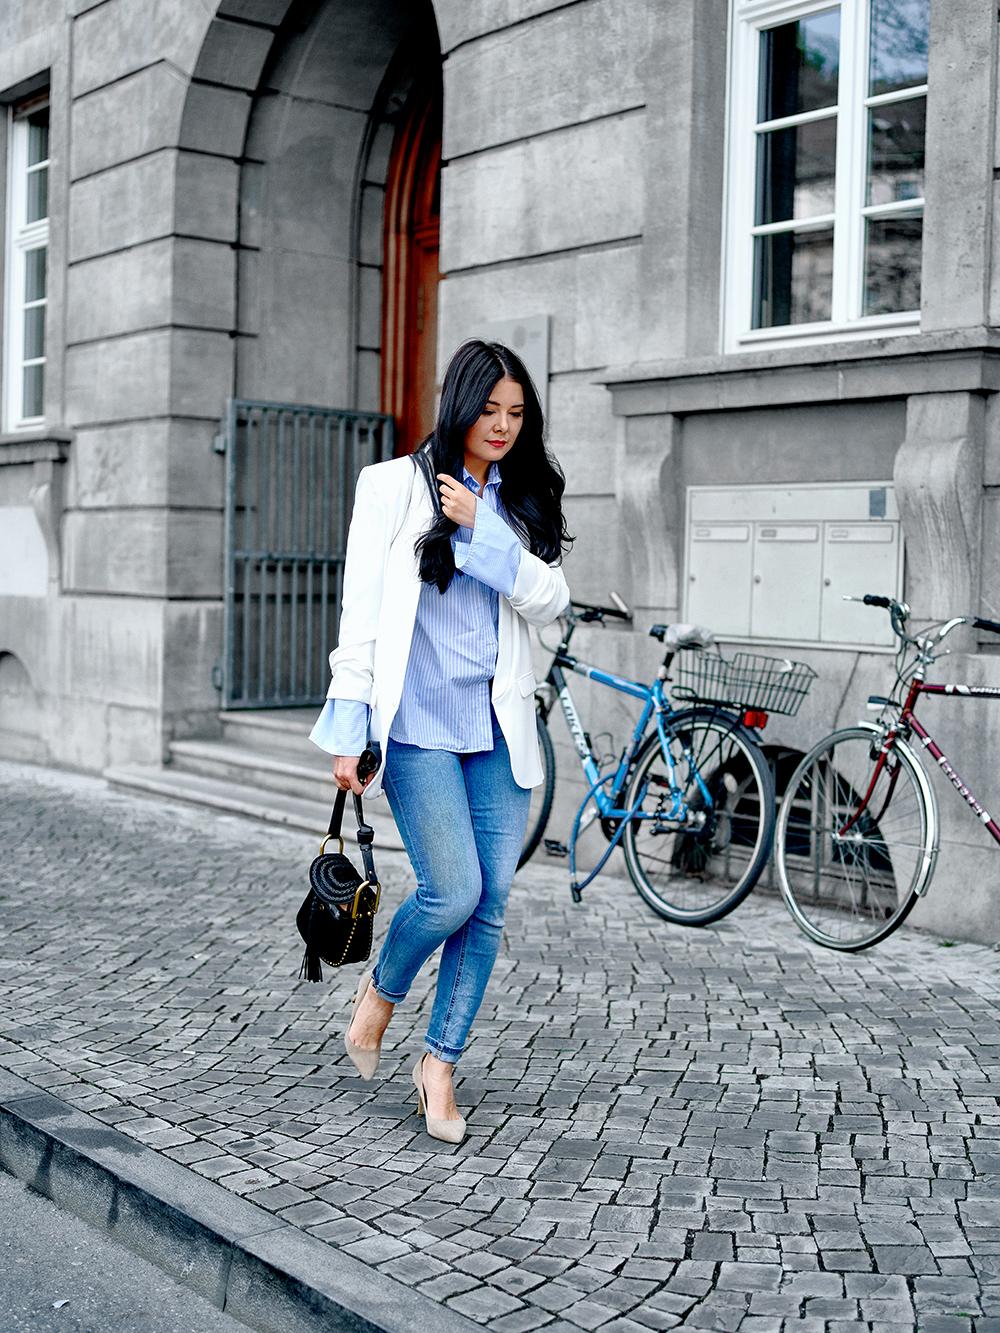 fashionambit-fashionblog-muenchen-modeblog-deutschland-blogger-modeblogger-fashionblogger-bloggerdeutschland-lifestyleblog-munich-style-blog-sommerlaune